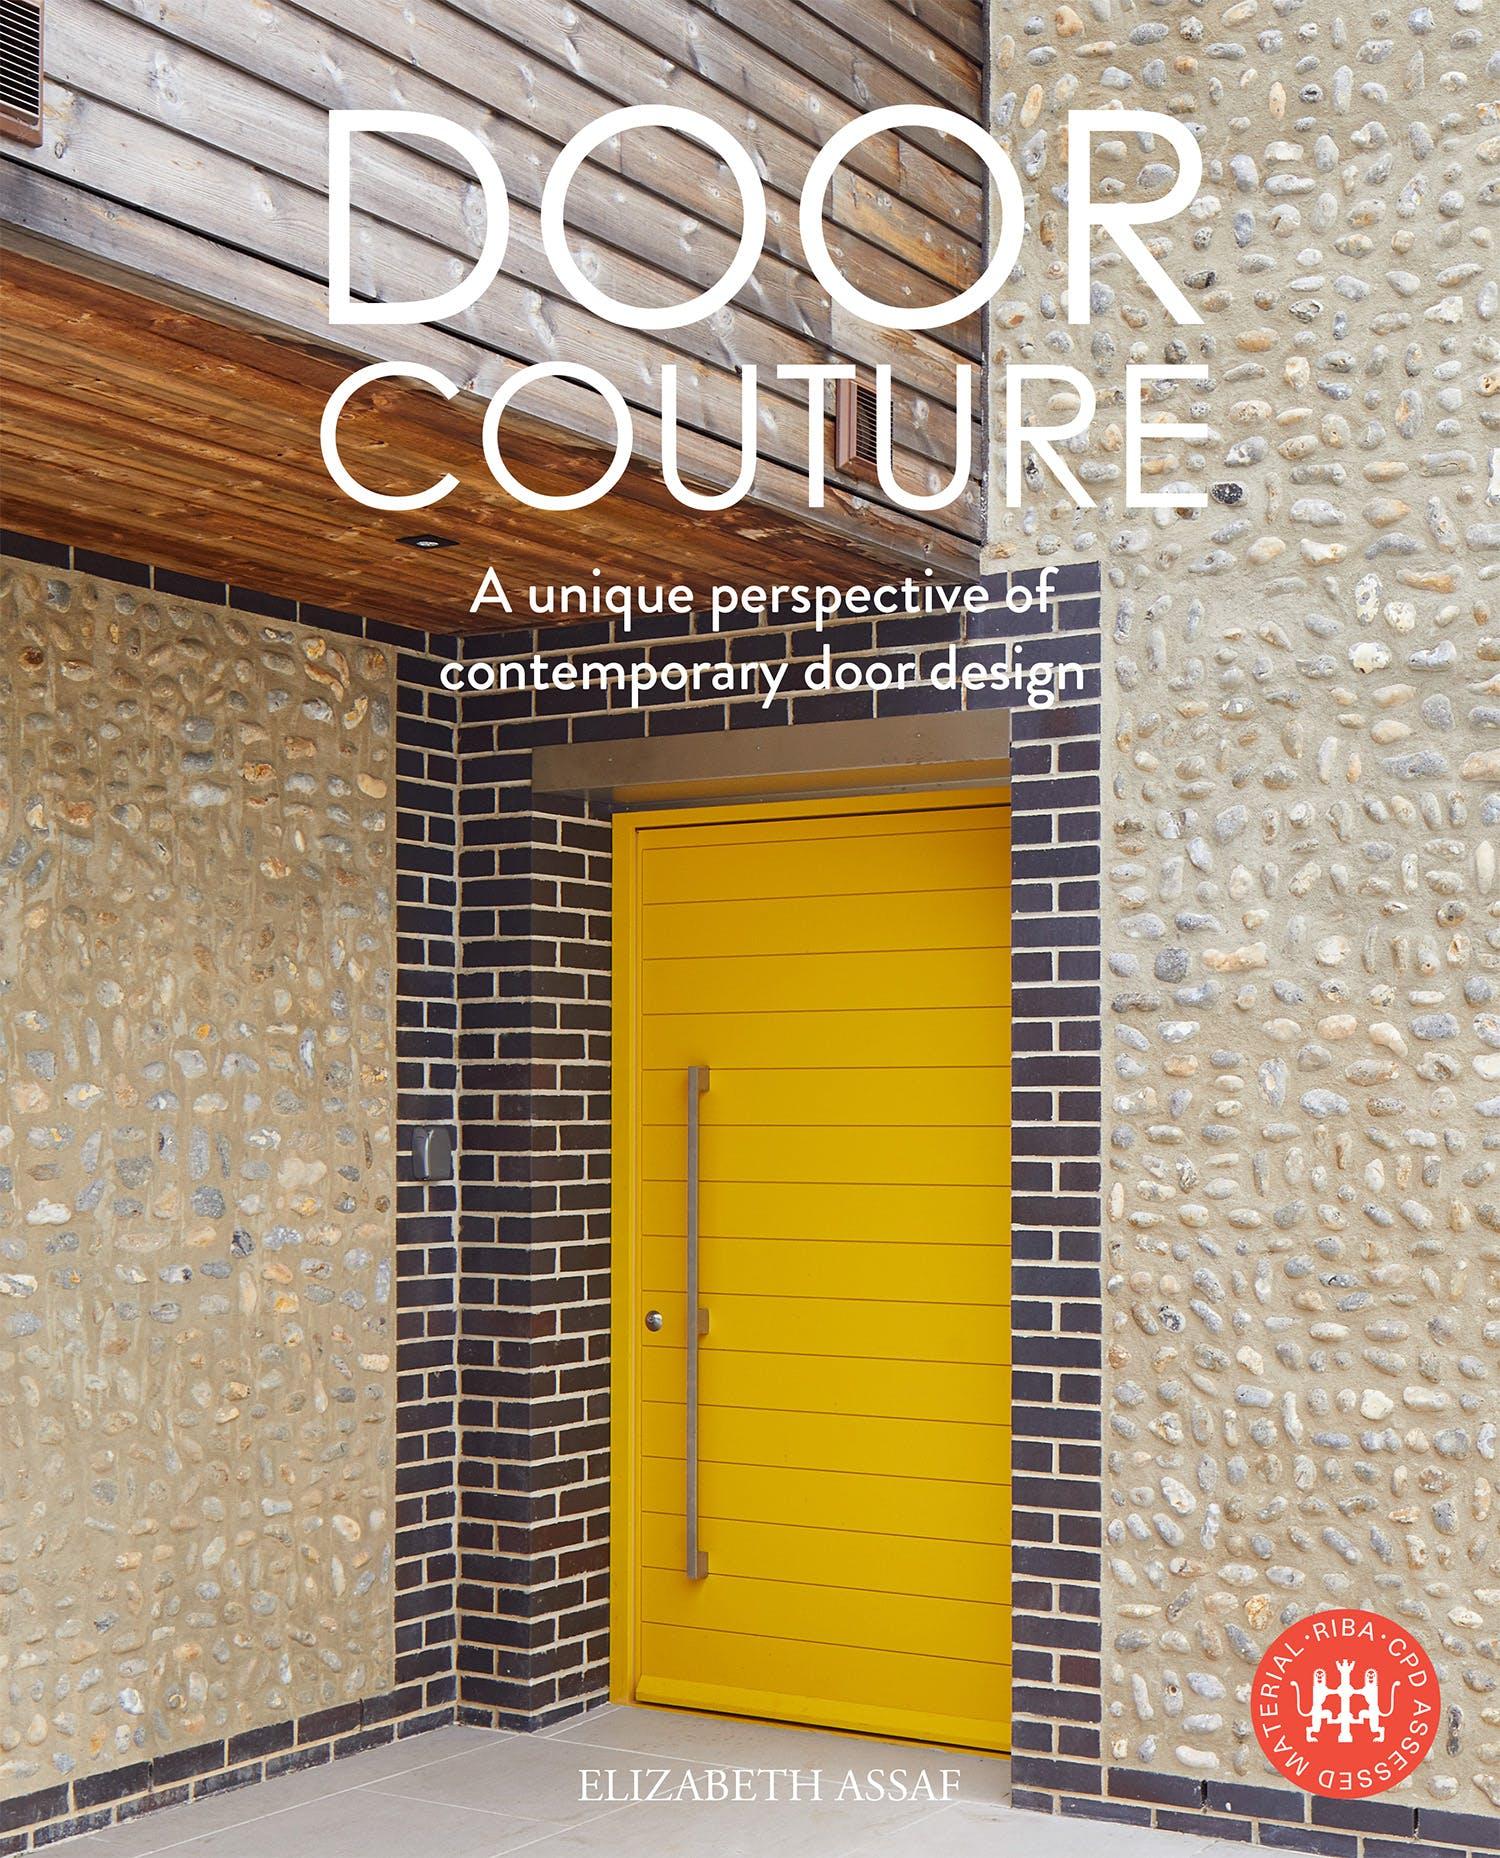 Door Couture: A unique perspective of Contemporary Door Design